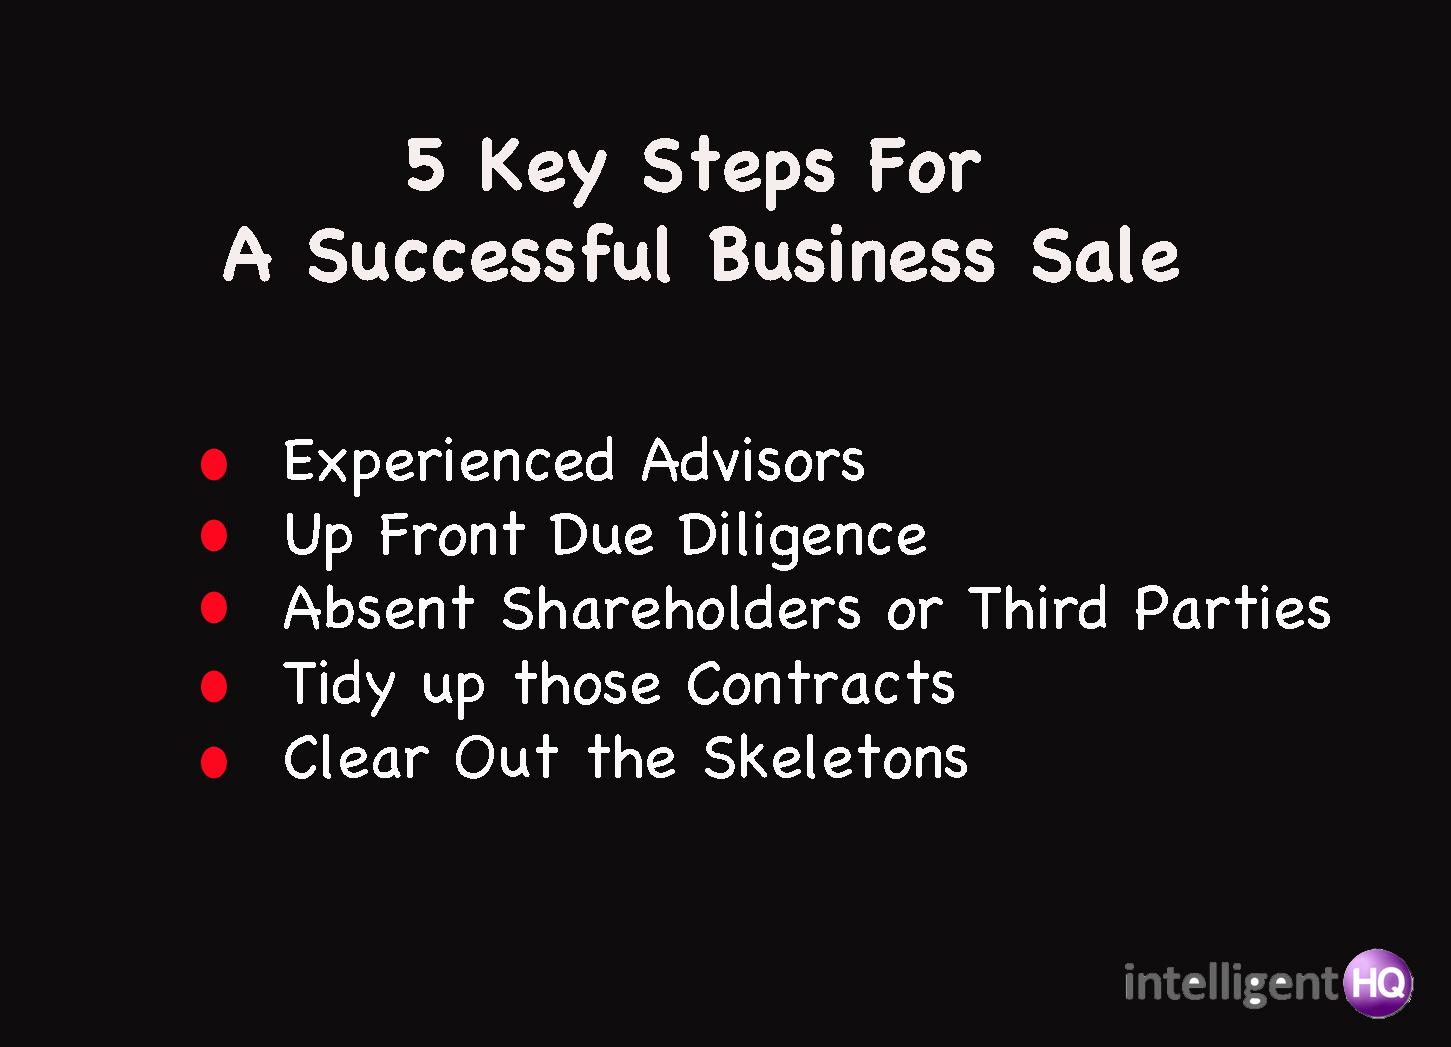 5 key steps for business sale Intelligenthq